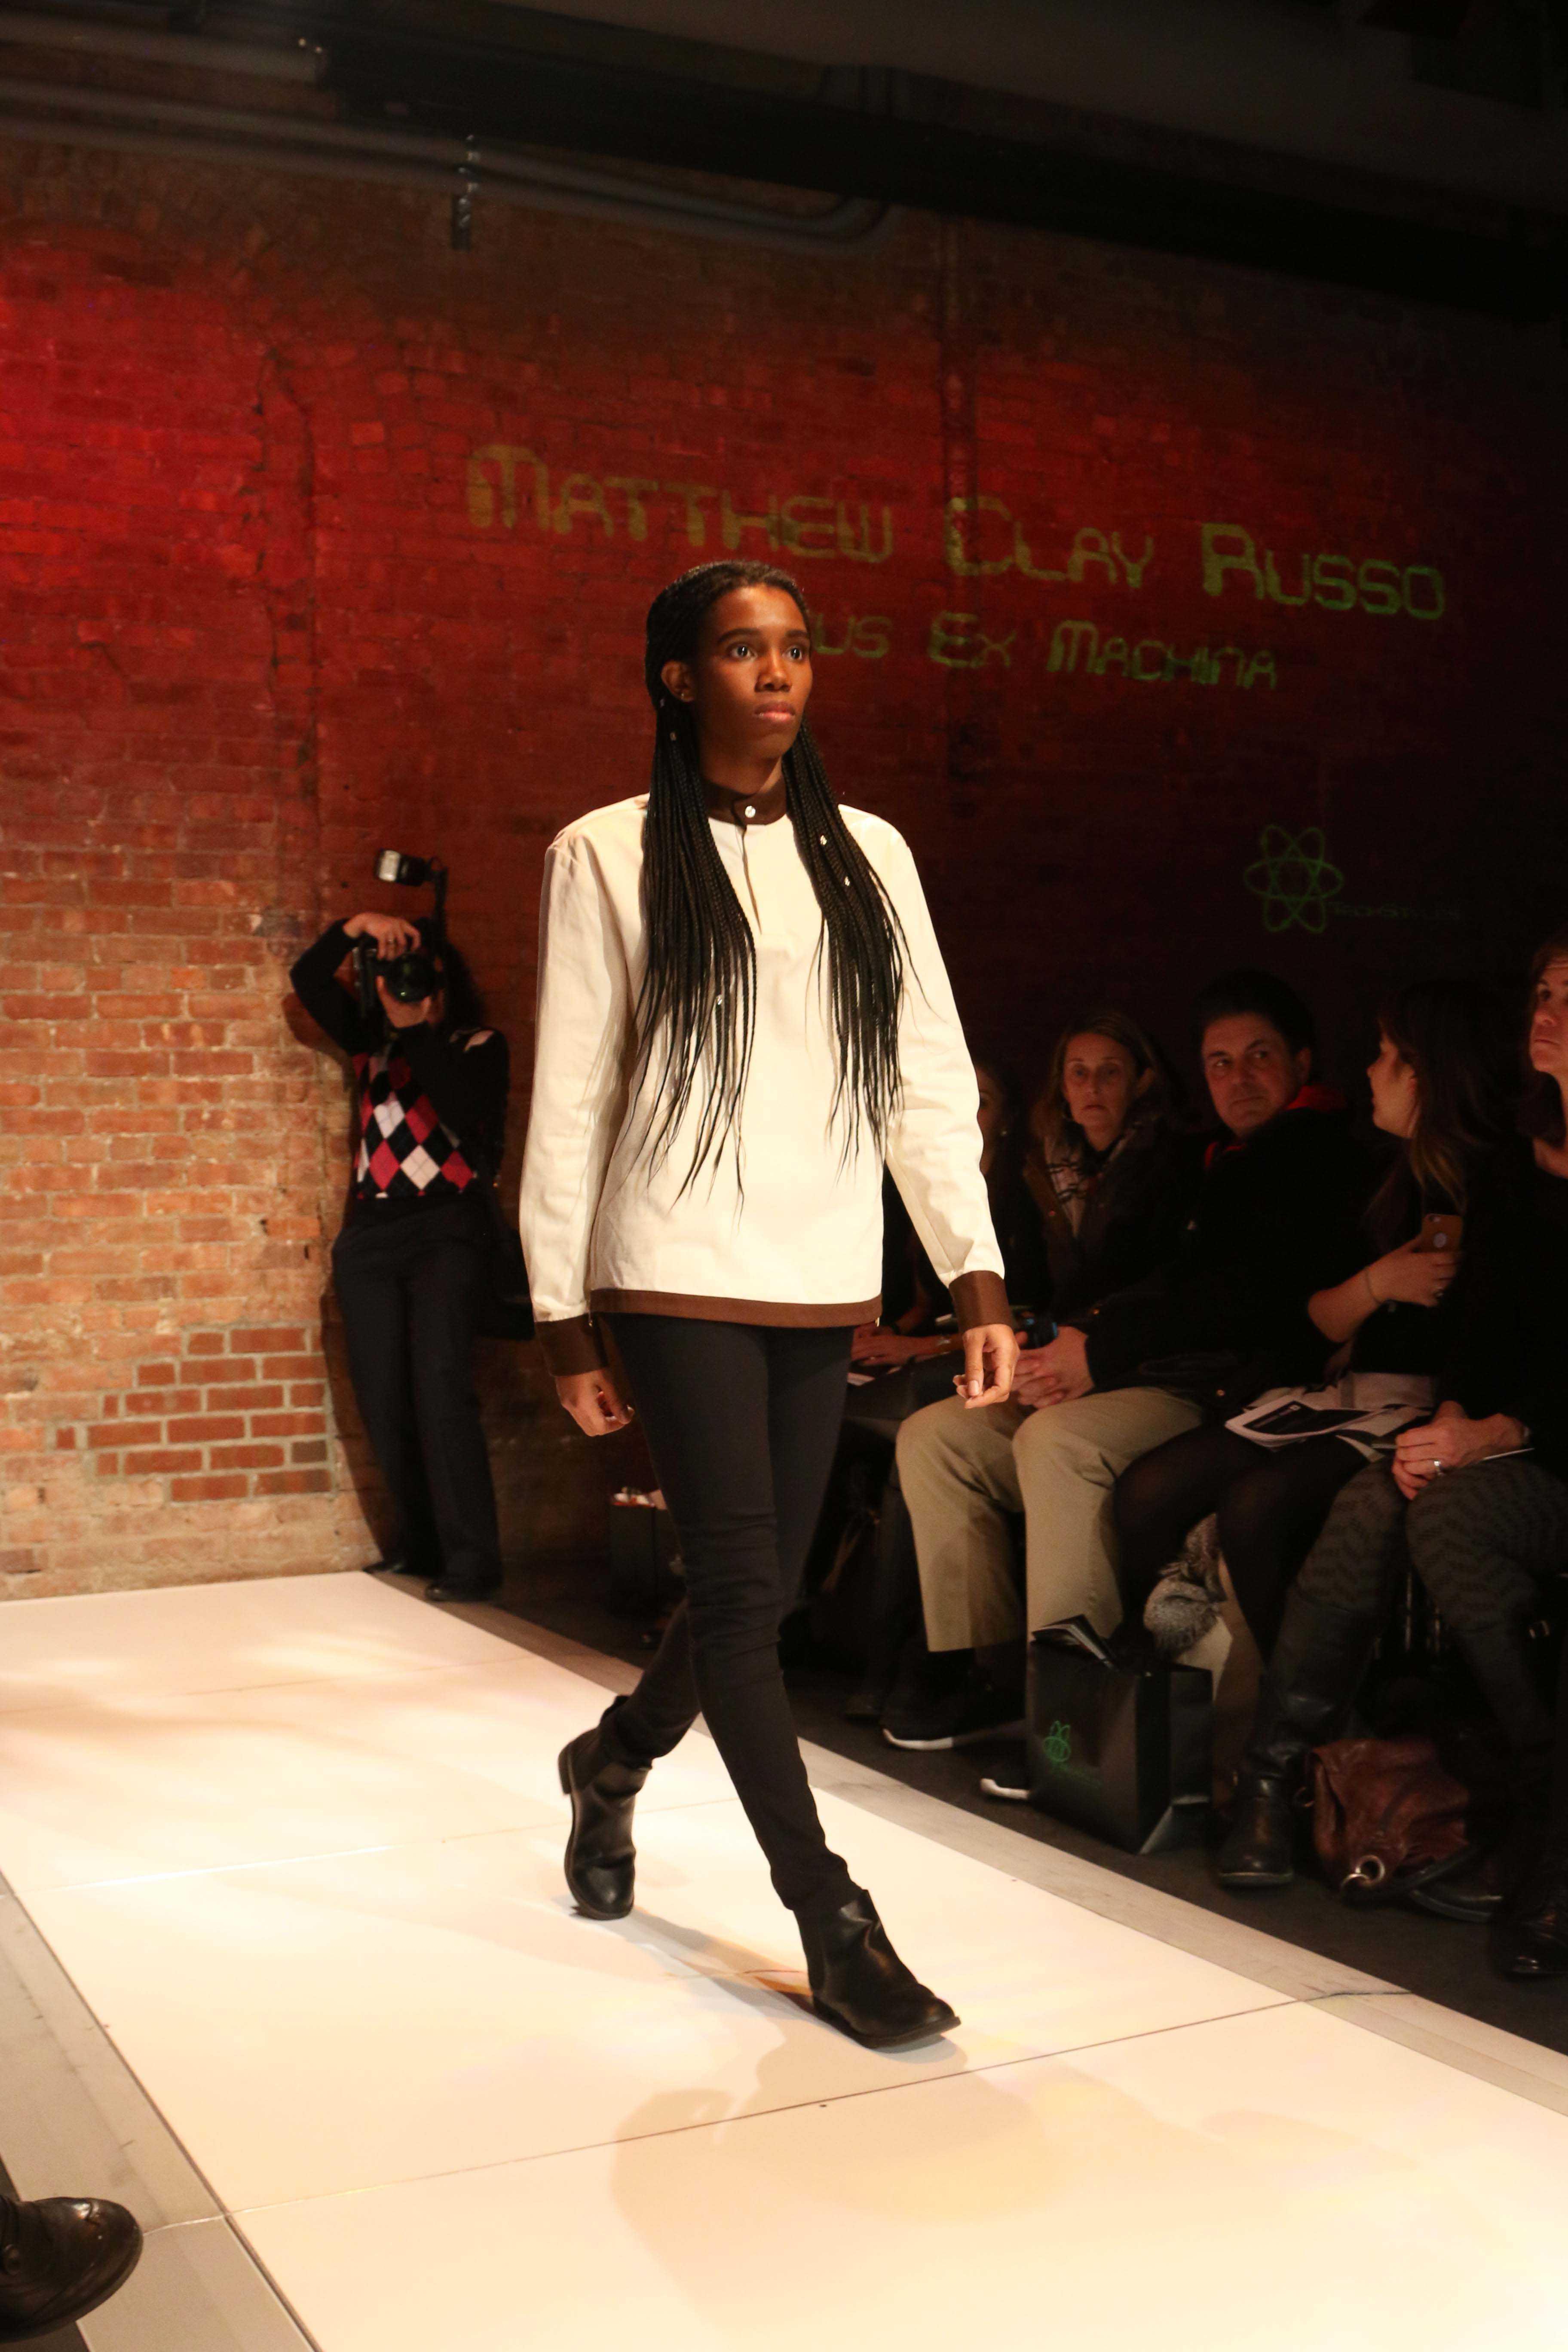 Gallatin Show Fashions Techstyles Washington Square News